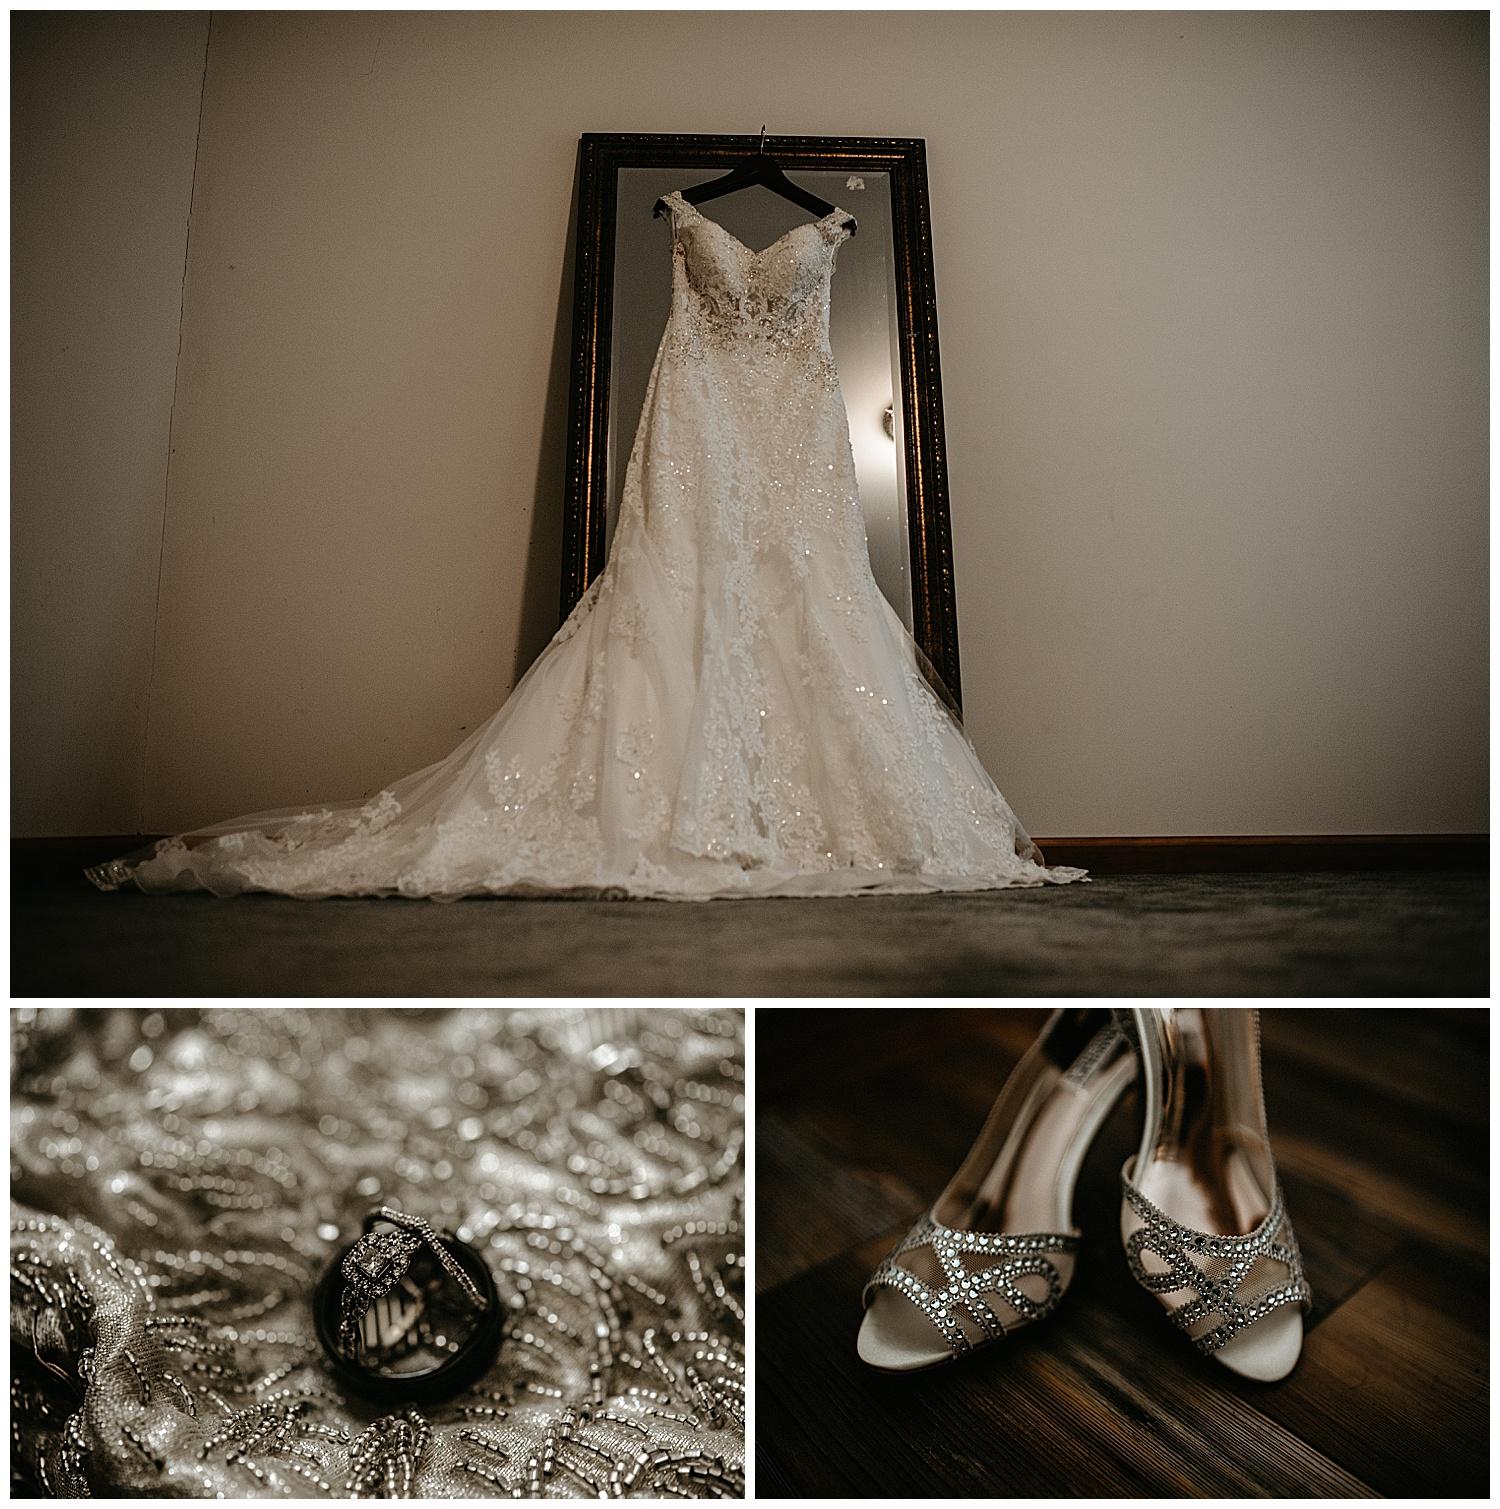 NEPA-Lehigh-Valley-Wedding-Photographer-at-Fountain-Springs-Country-Inn-Ashland-PA_0001.jpg